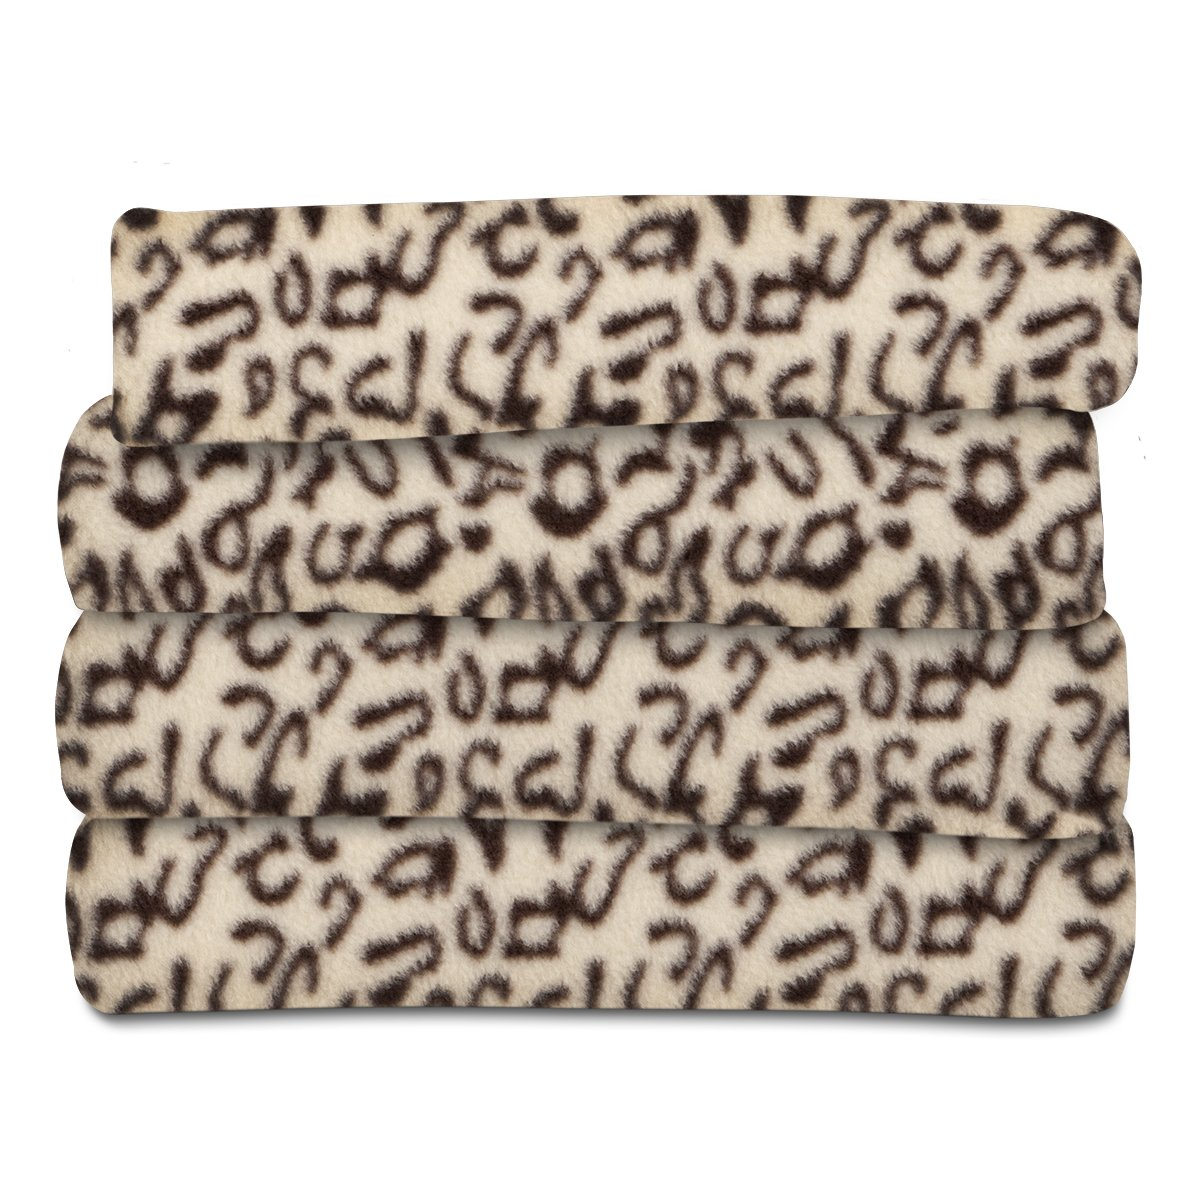 Sunbeam Heated Throw Blanket | Fleece, 3 Heat Settings, Cheetah